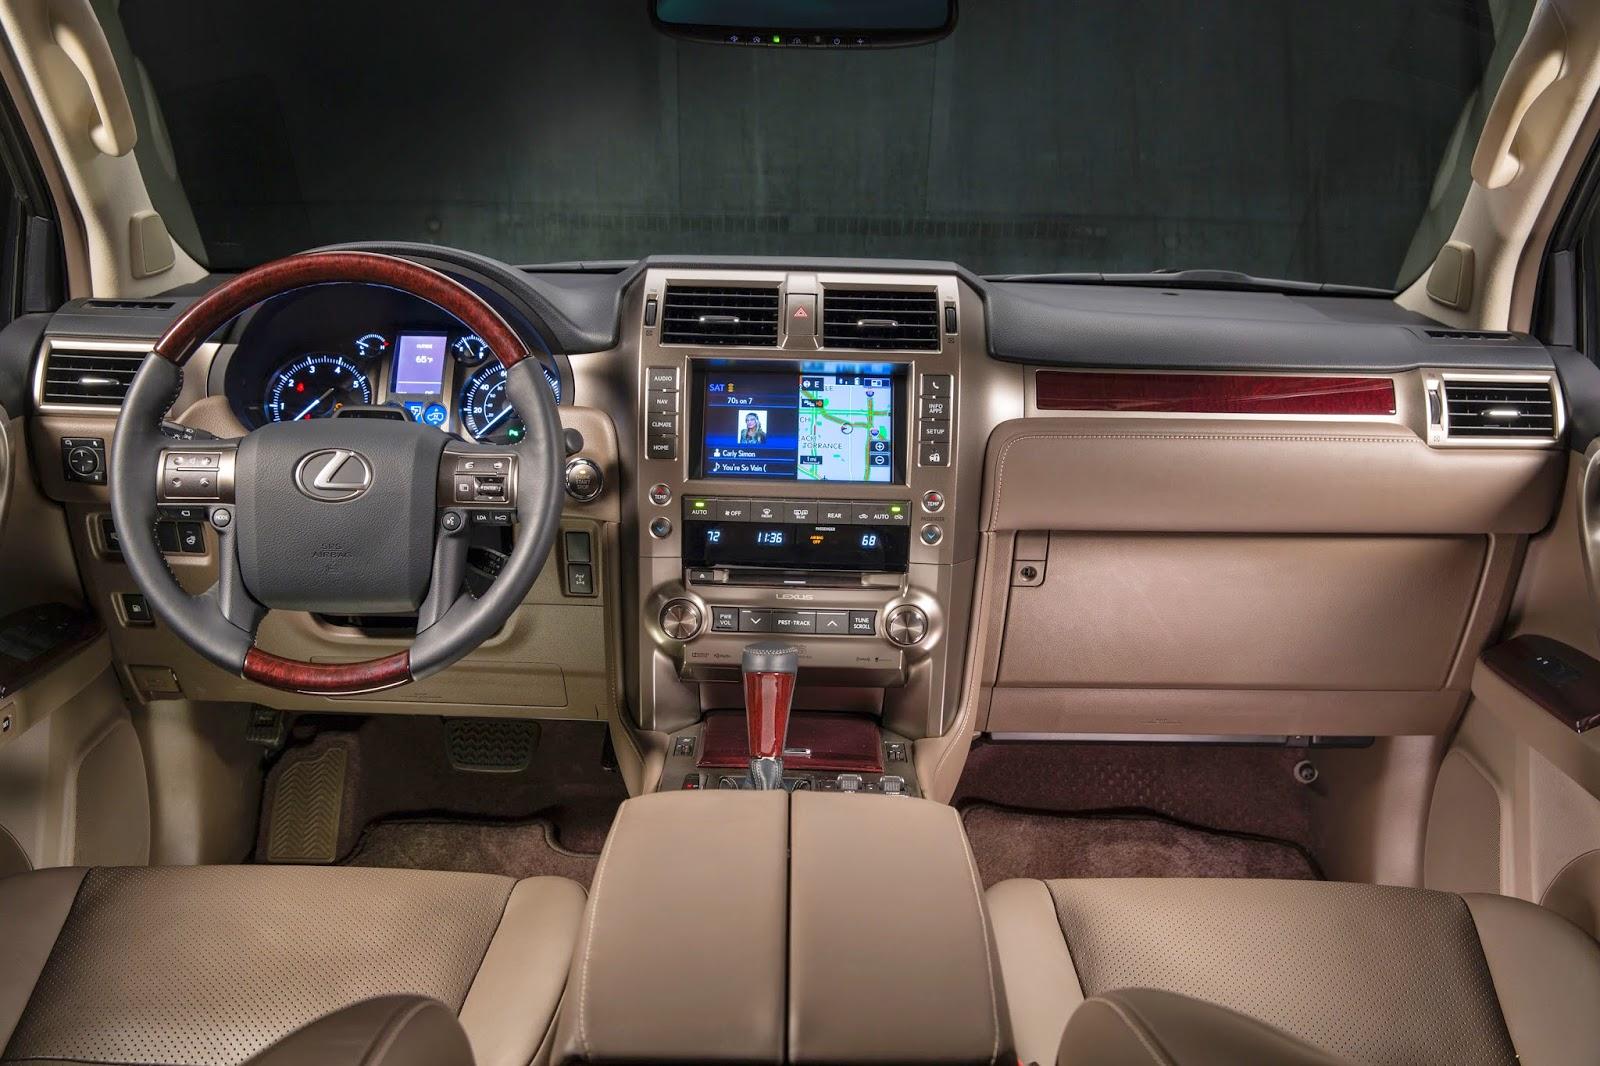 Interior view of 2014 Lexus GX460